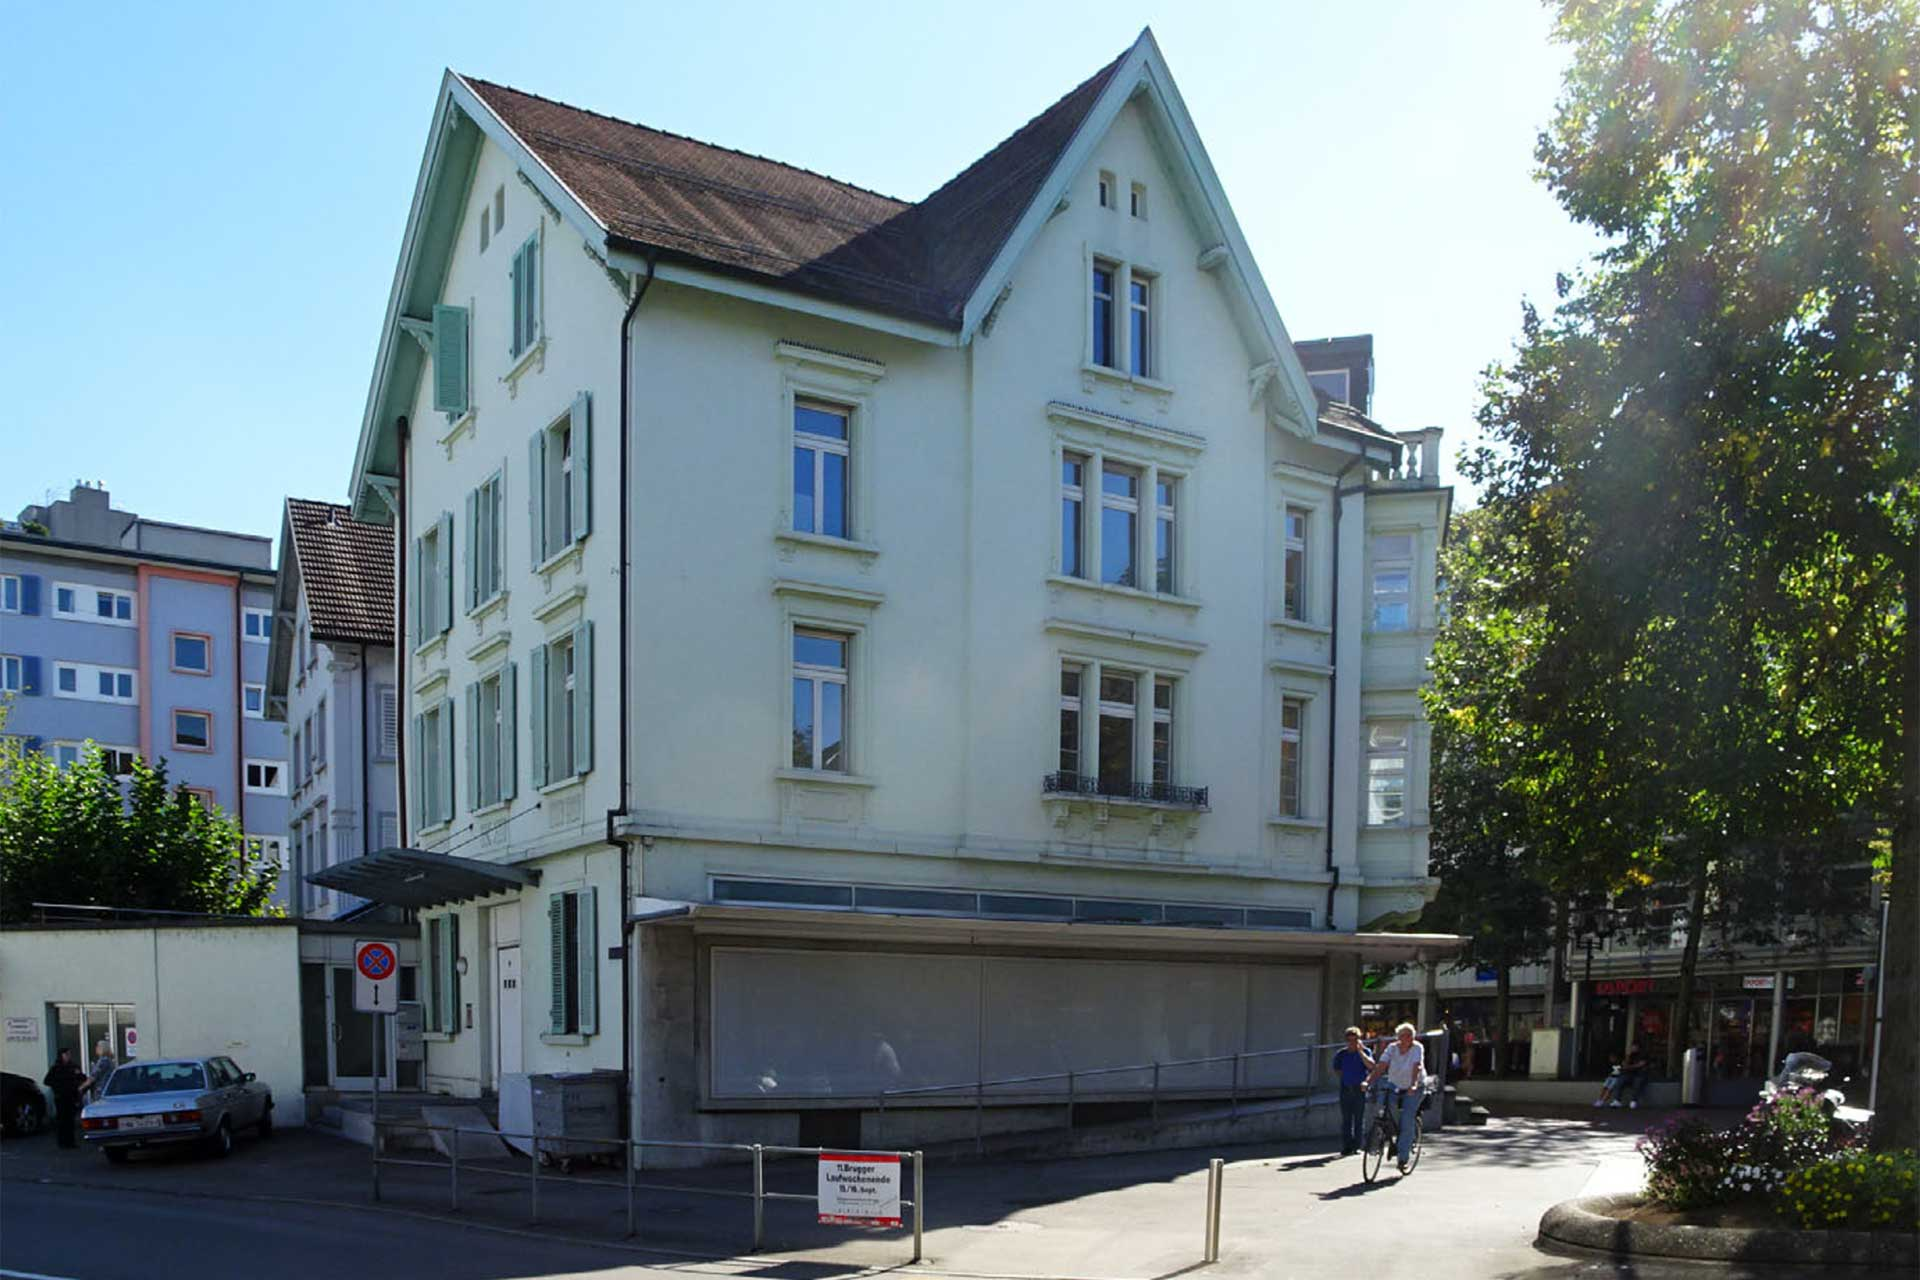 190125-BRNE-Vis-Bestand-Projekt—optimiert-1